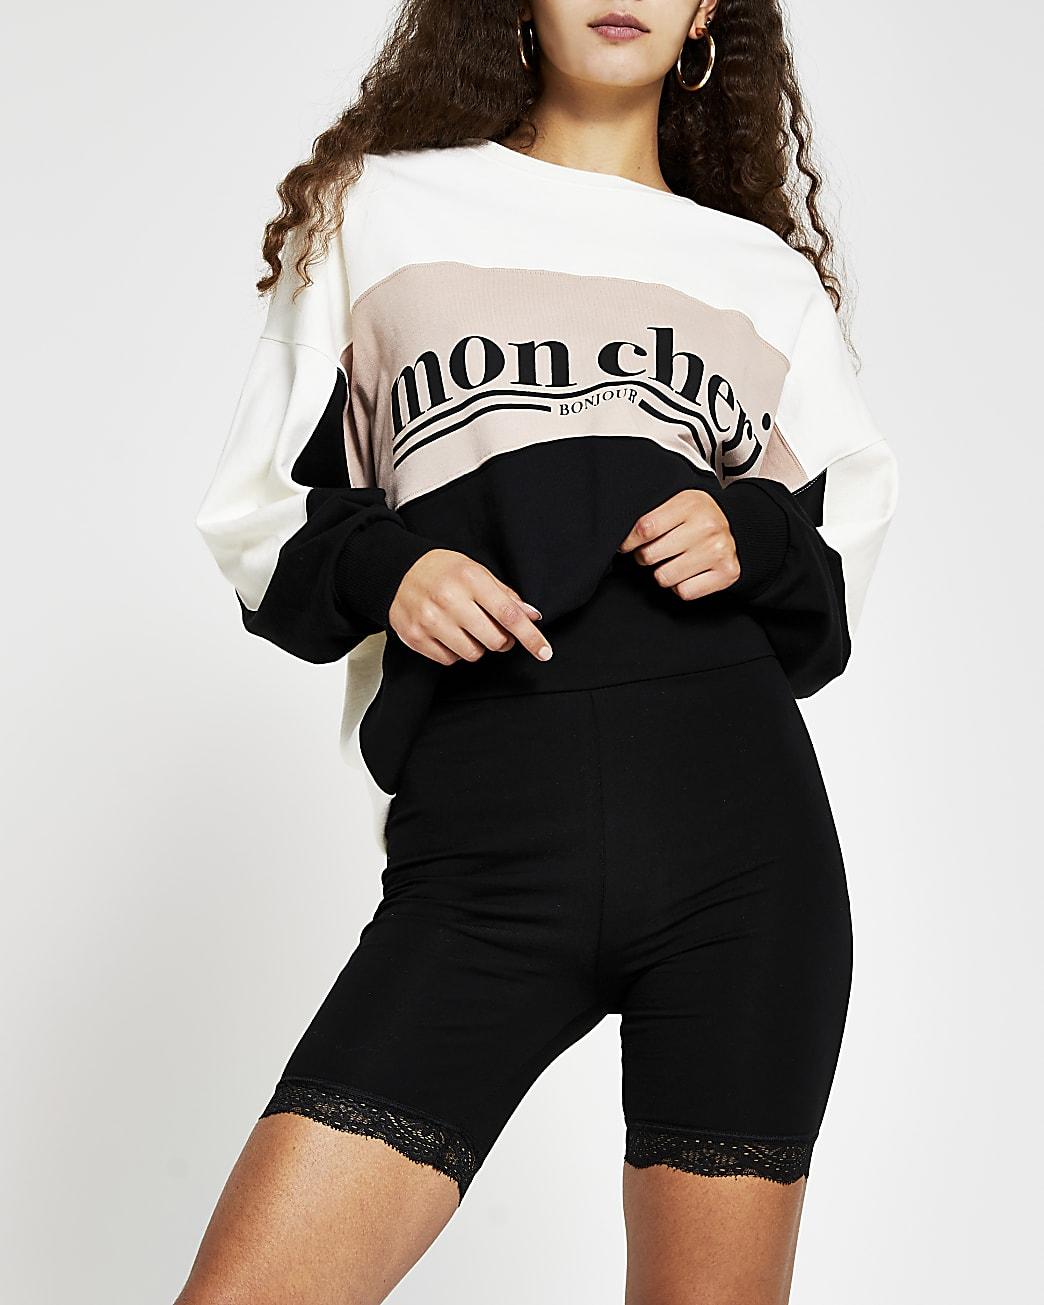 Black high waist lace trim cycling shorts